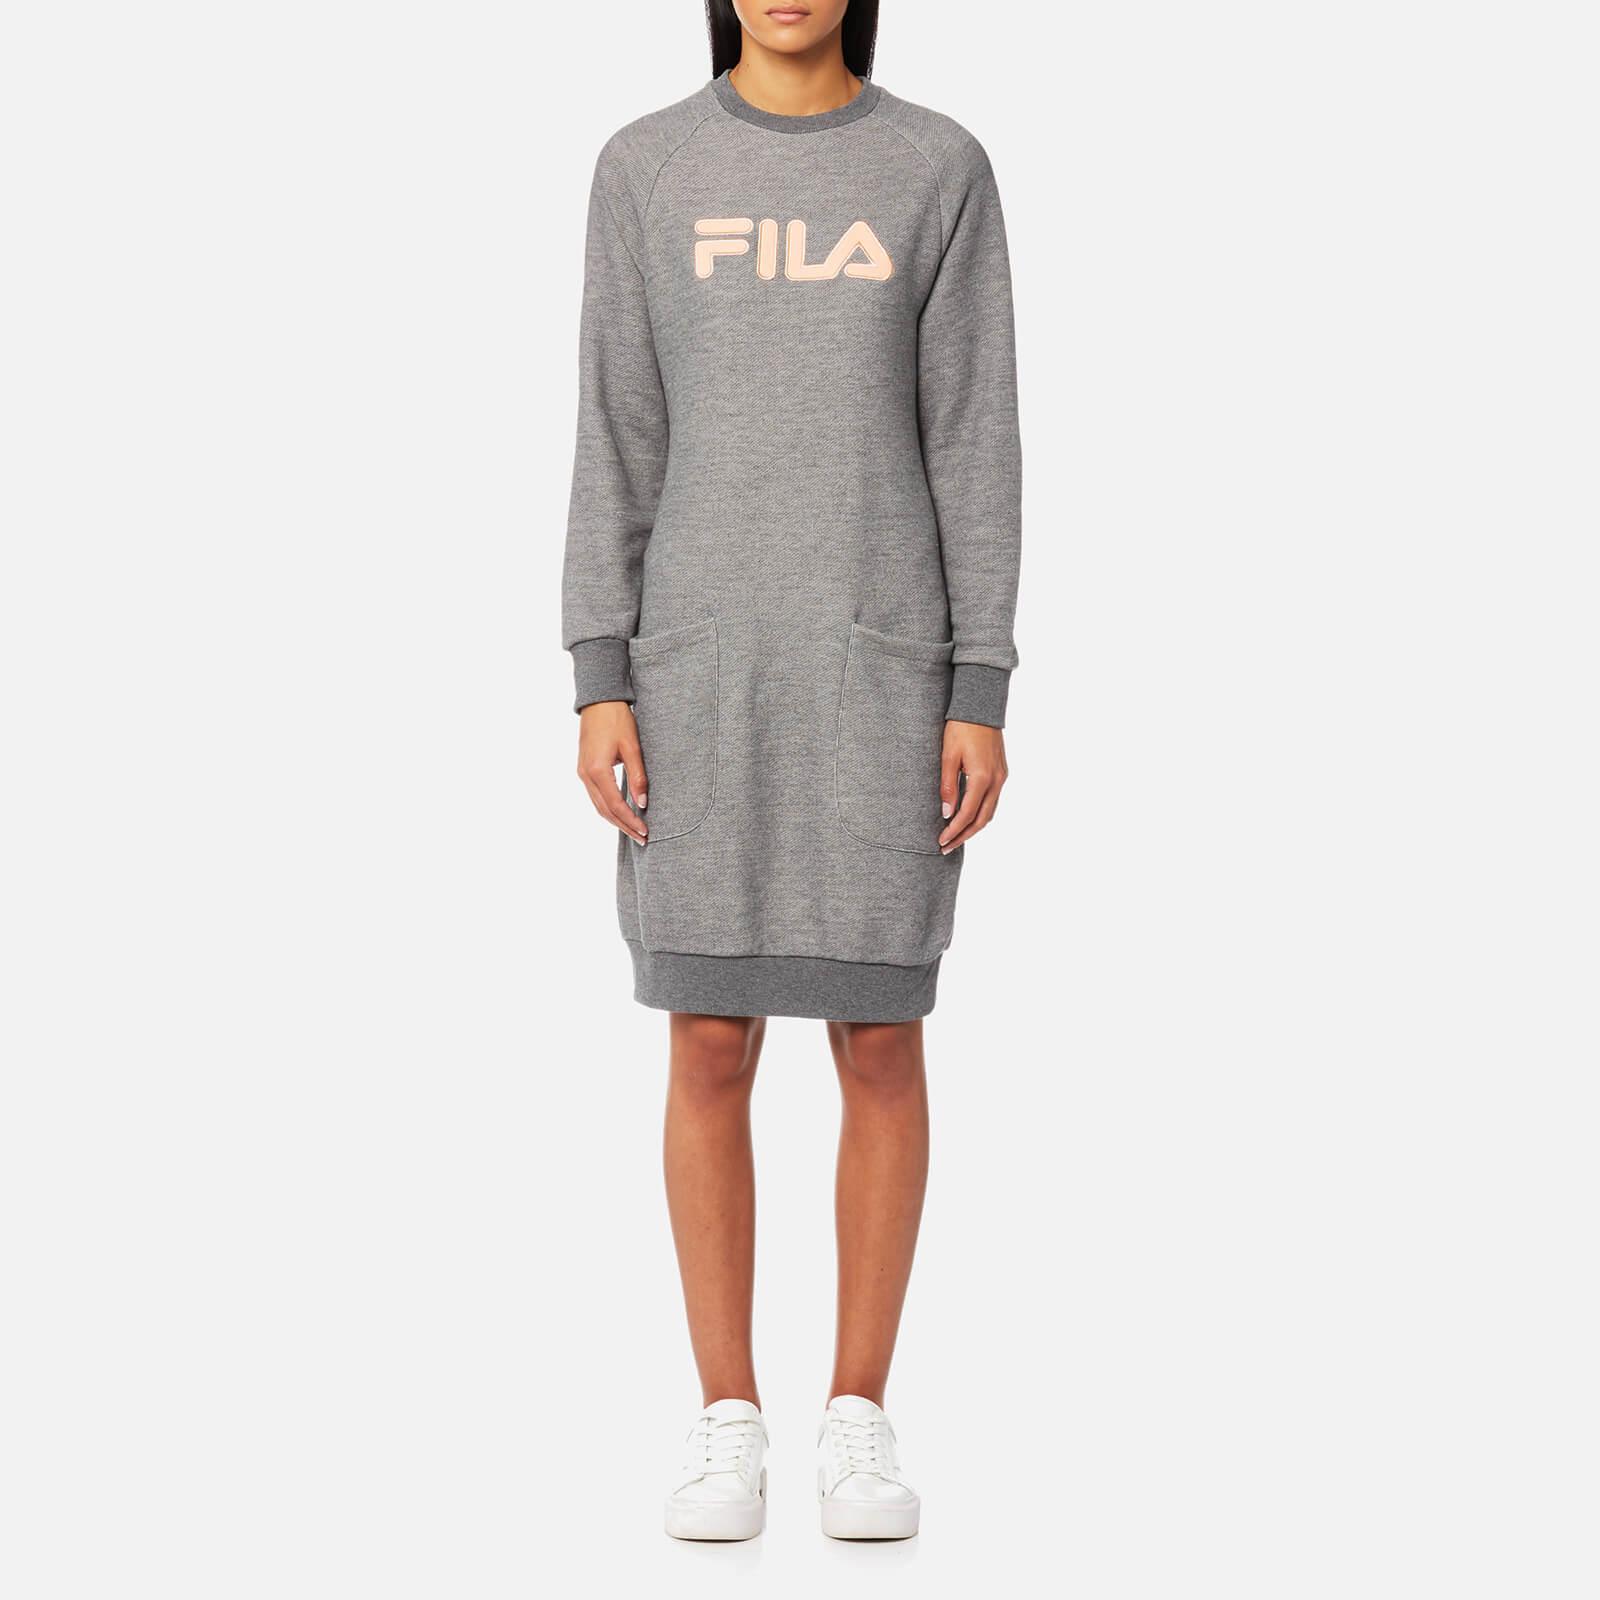 108ca8d610c5a FILA Blackline Women's Courtney Sweater Dress - Grey Marl - Free UK  Delivery over £50